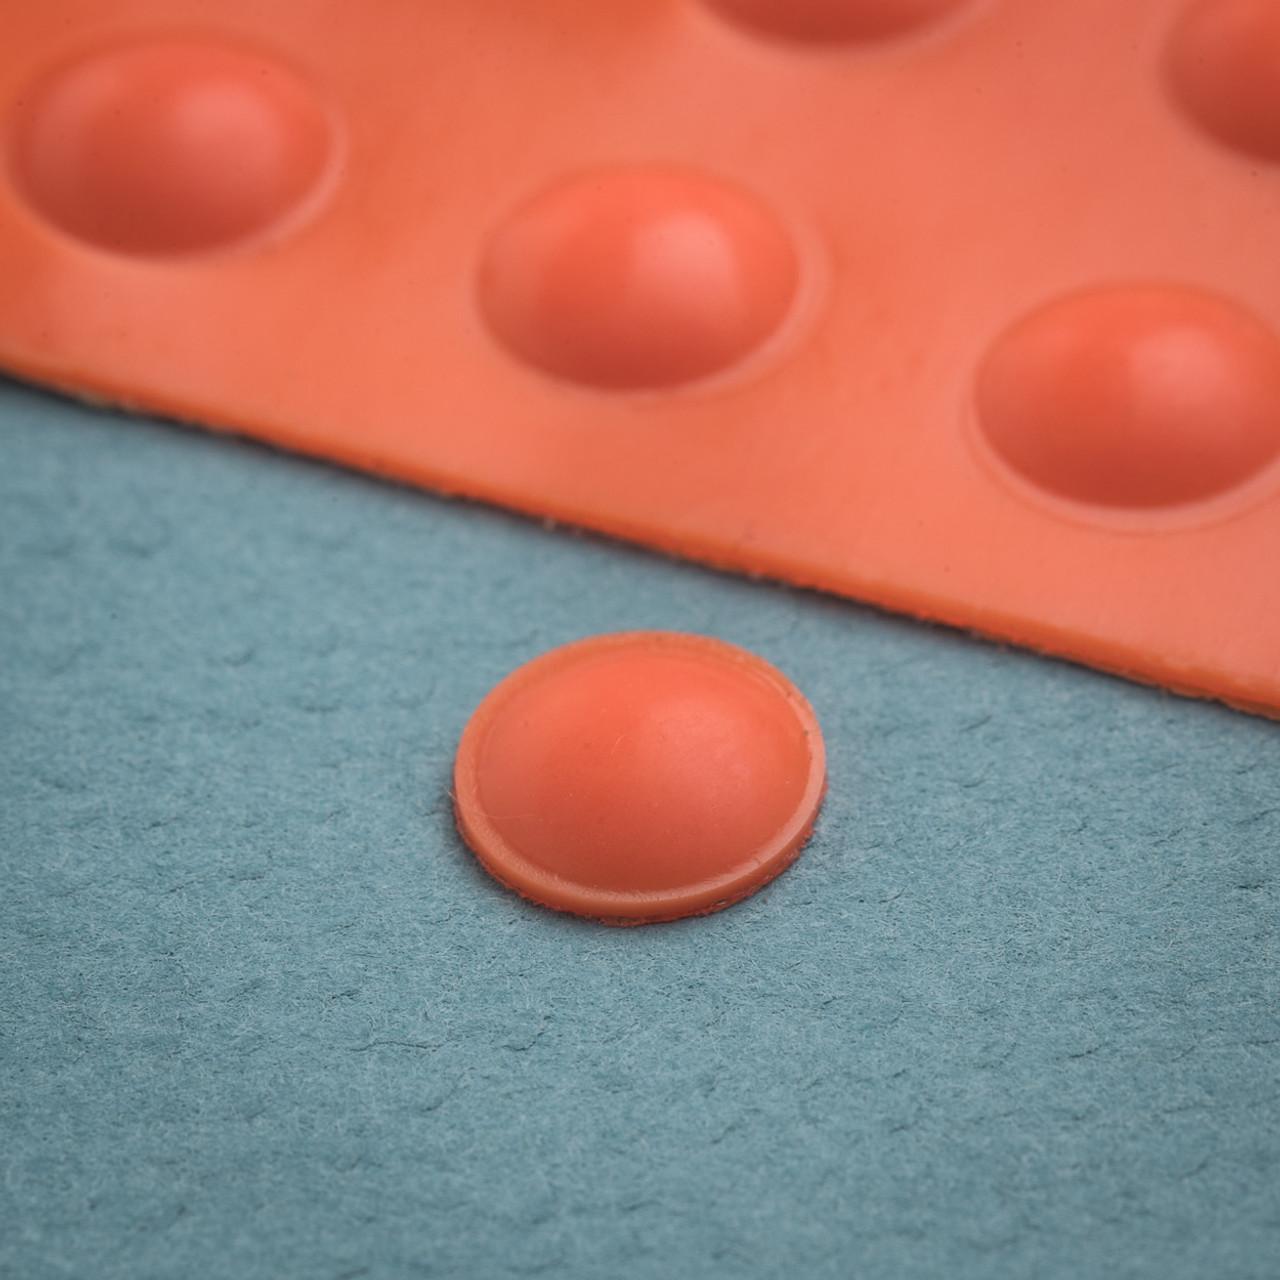 CAN-DO Bumps-25 Small Orange Round